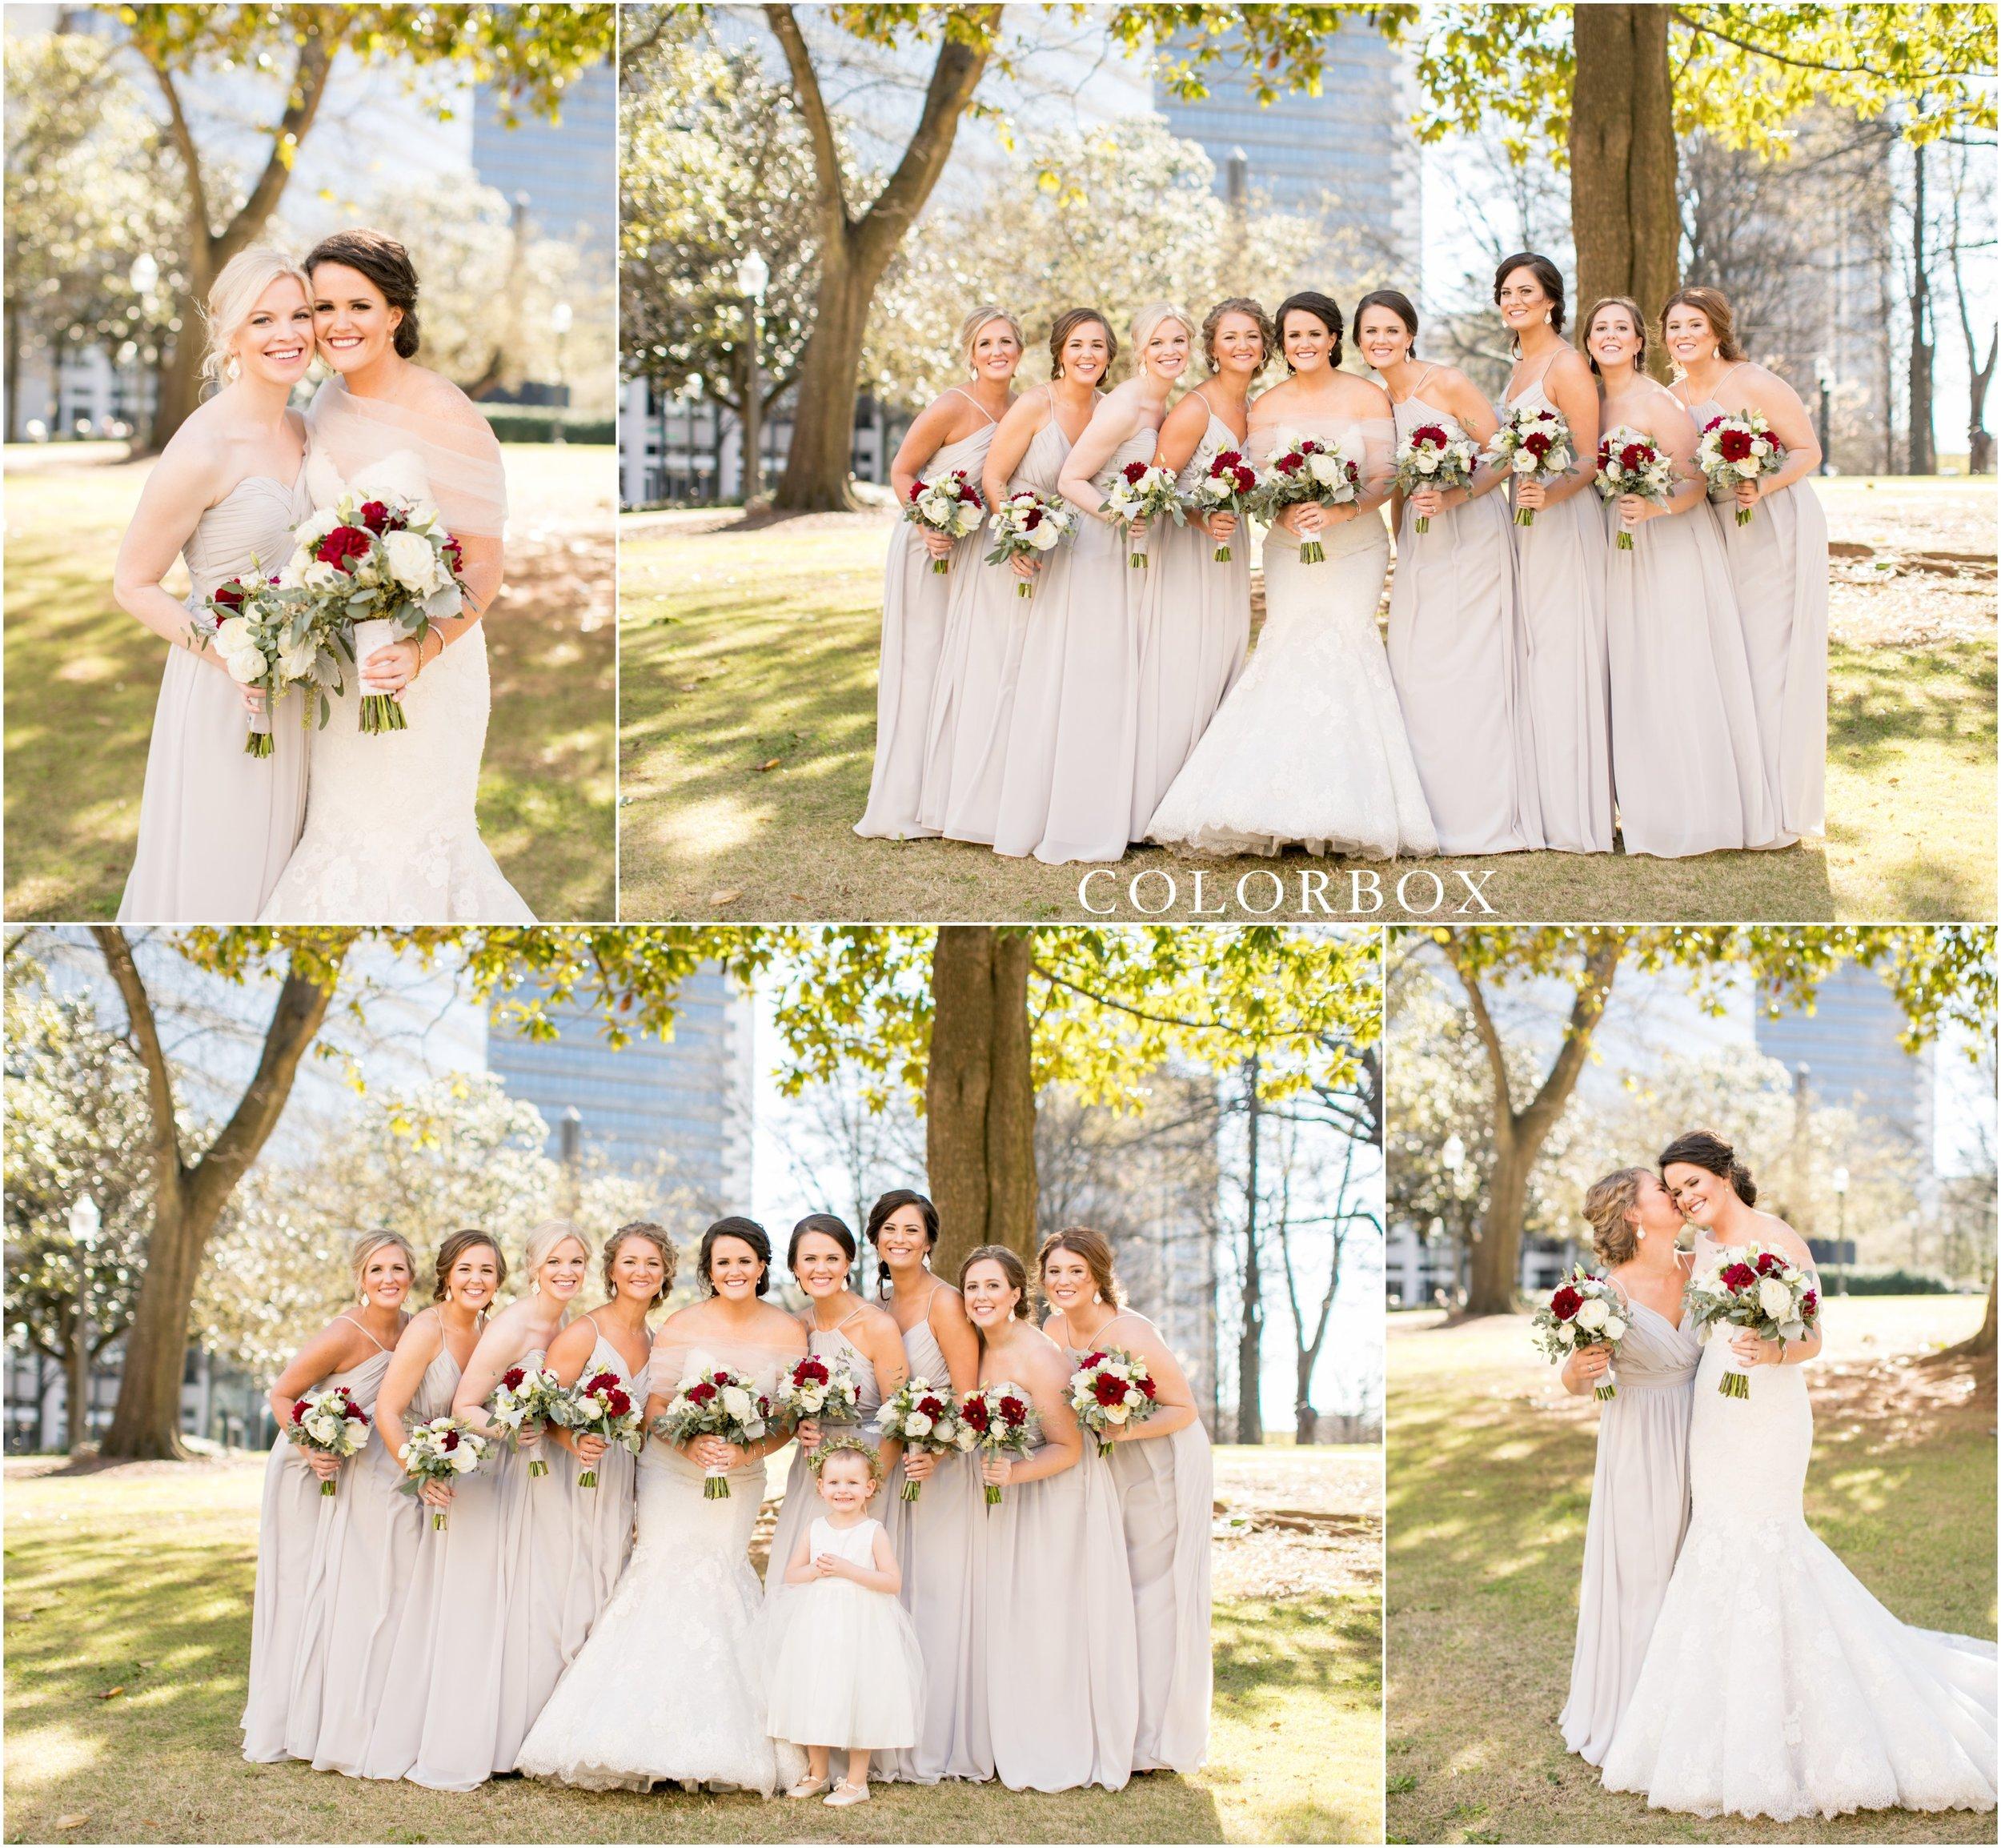 colorboxphotographers_5784.jpg